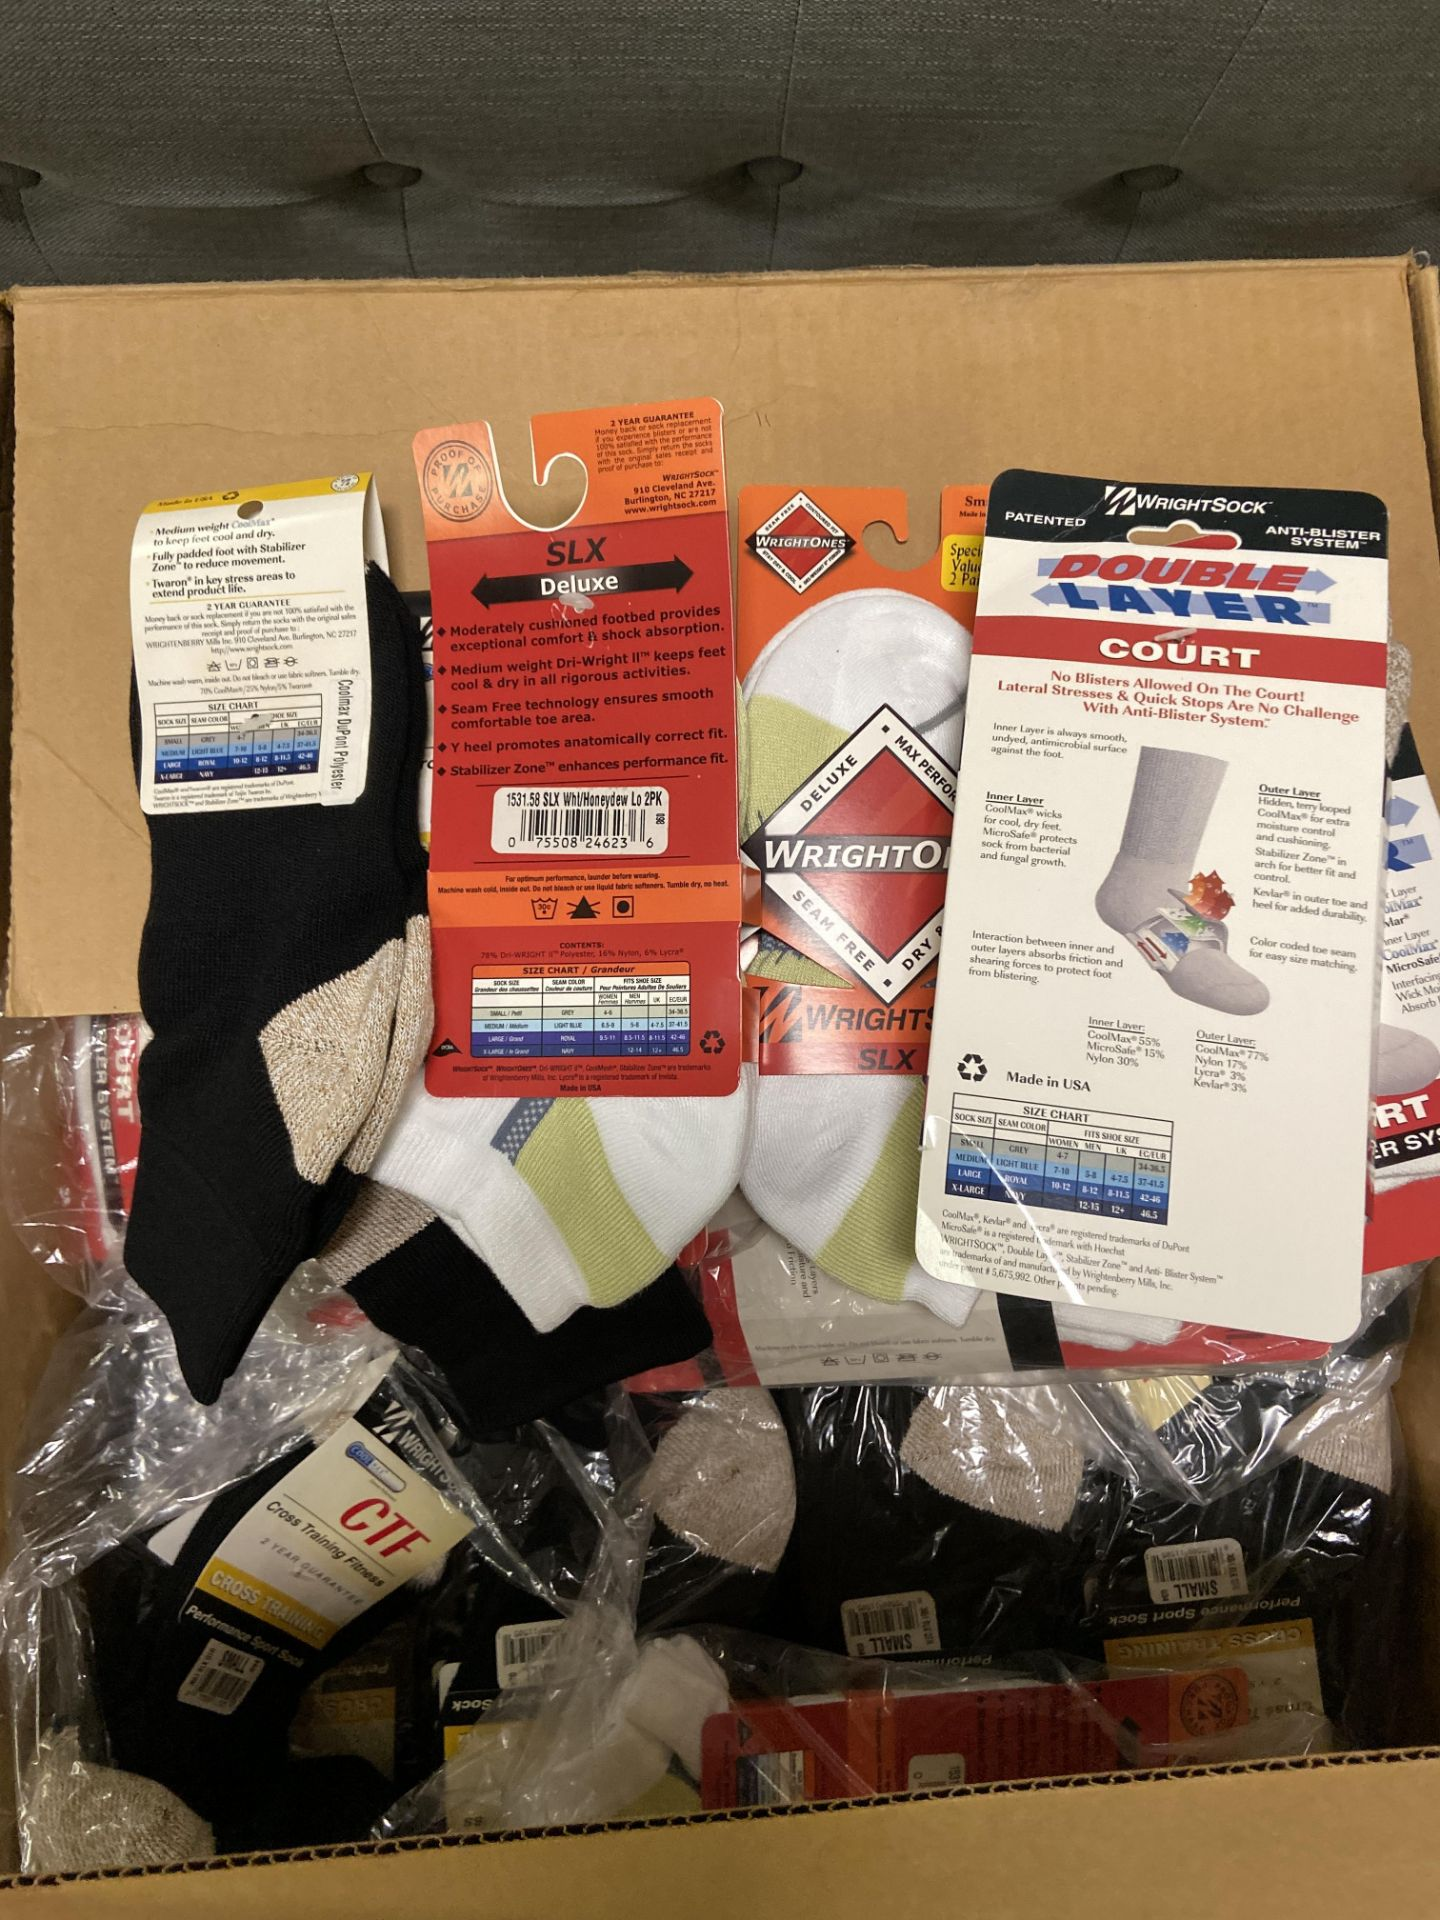 250+ packs of New Socks, Wrightsocks Various Styles, Various Colors - Image 2 of 2